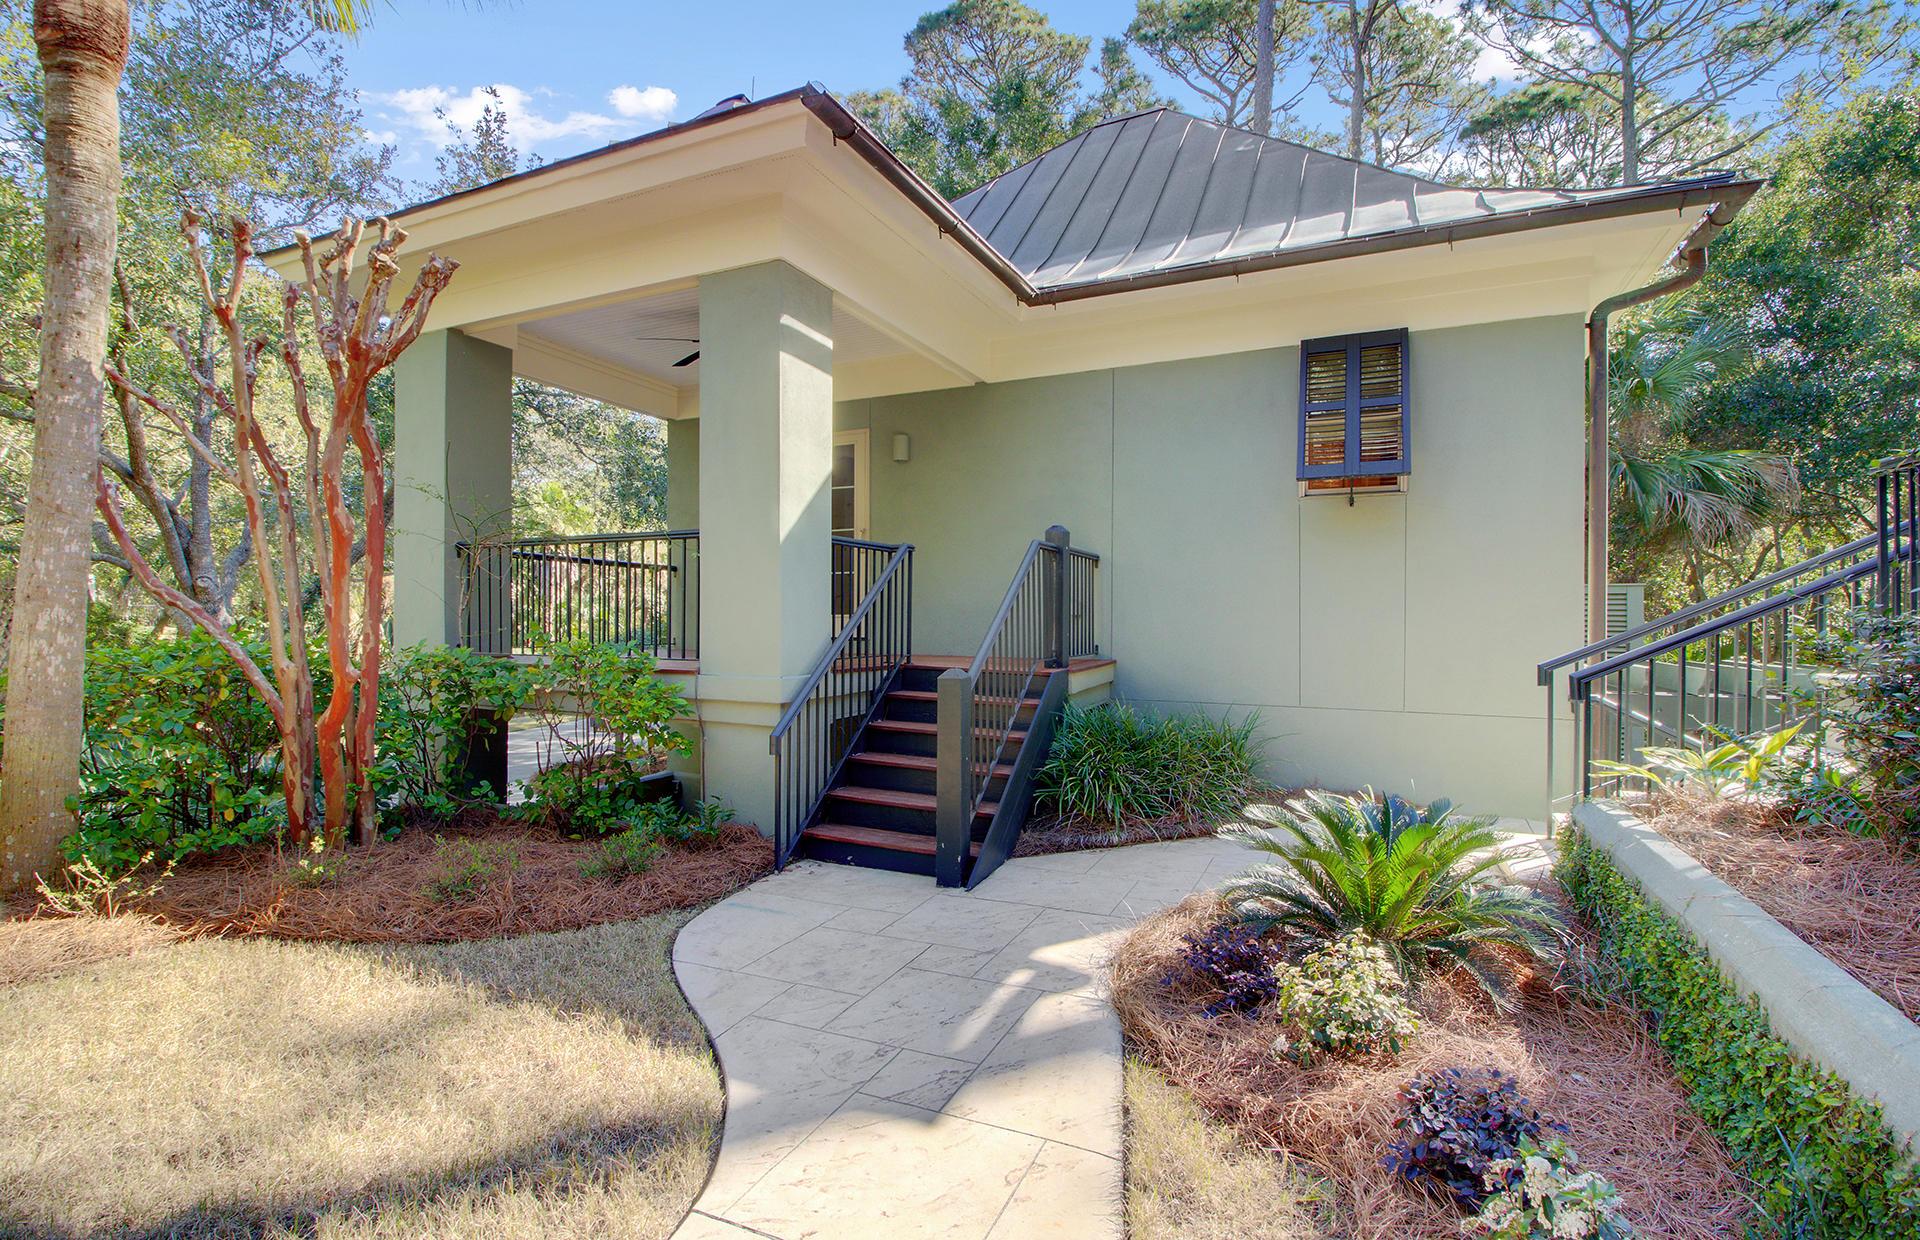 Kiawah Island Homes For Sale - 402 Ocean Oaks, Kiawah Island, SC - 13